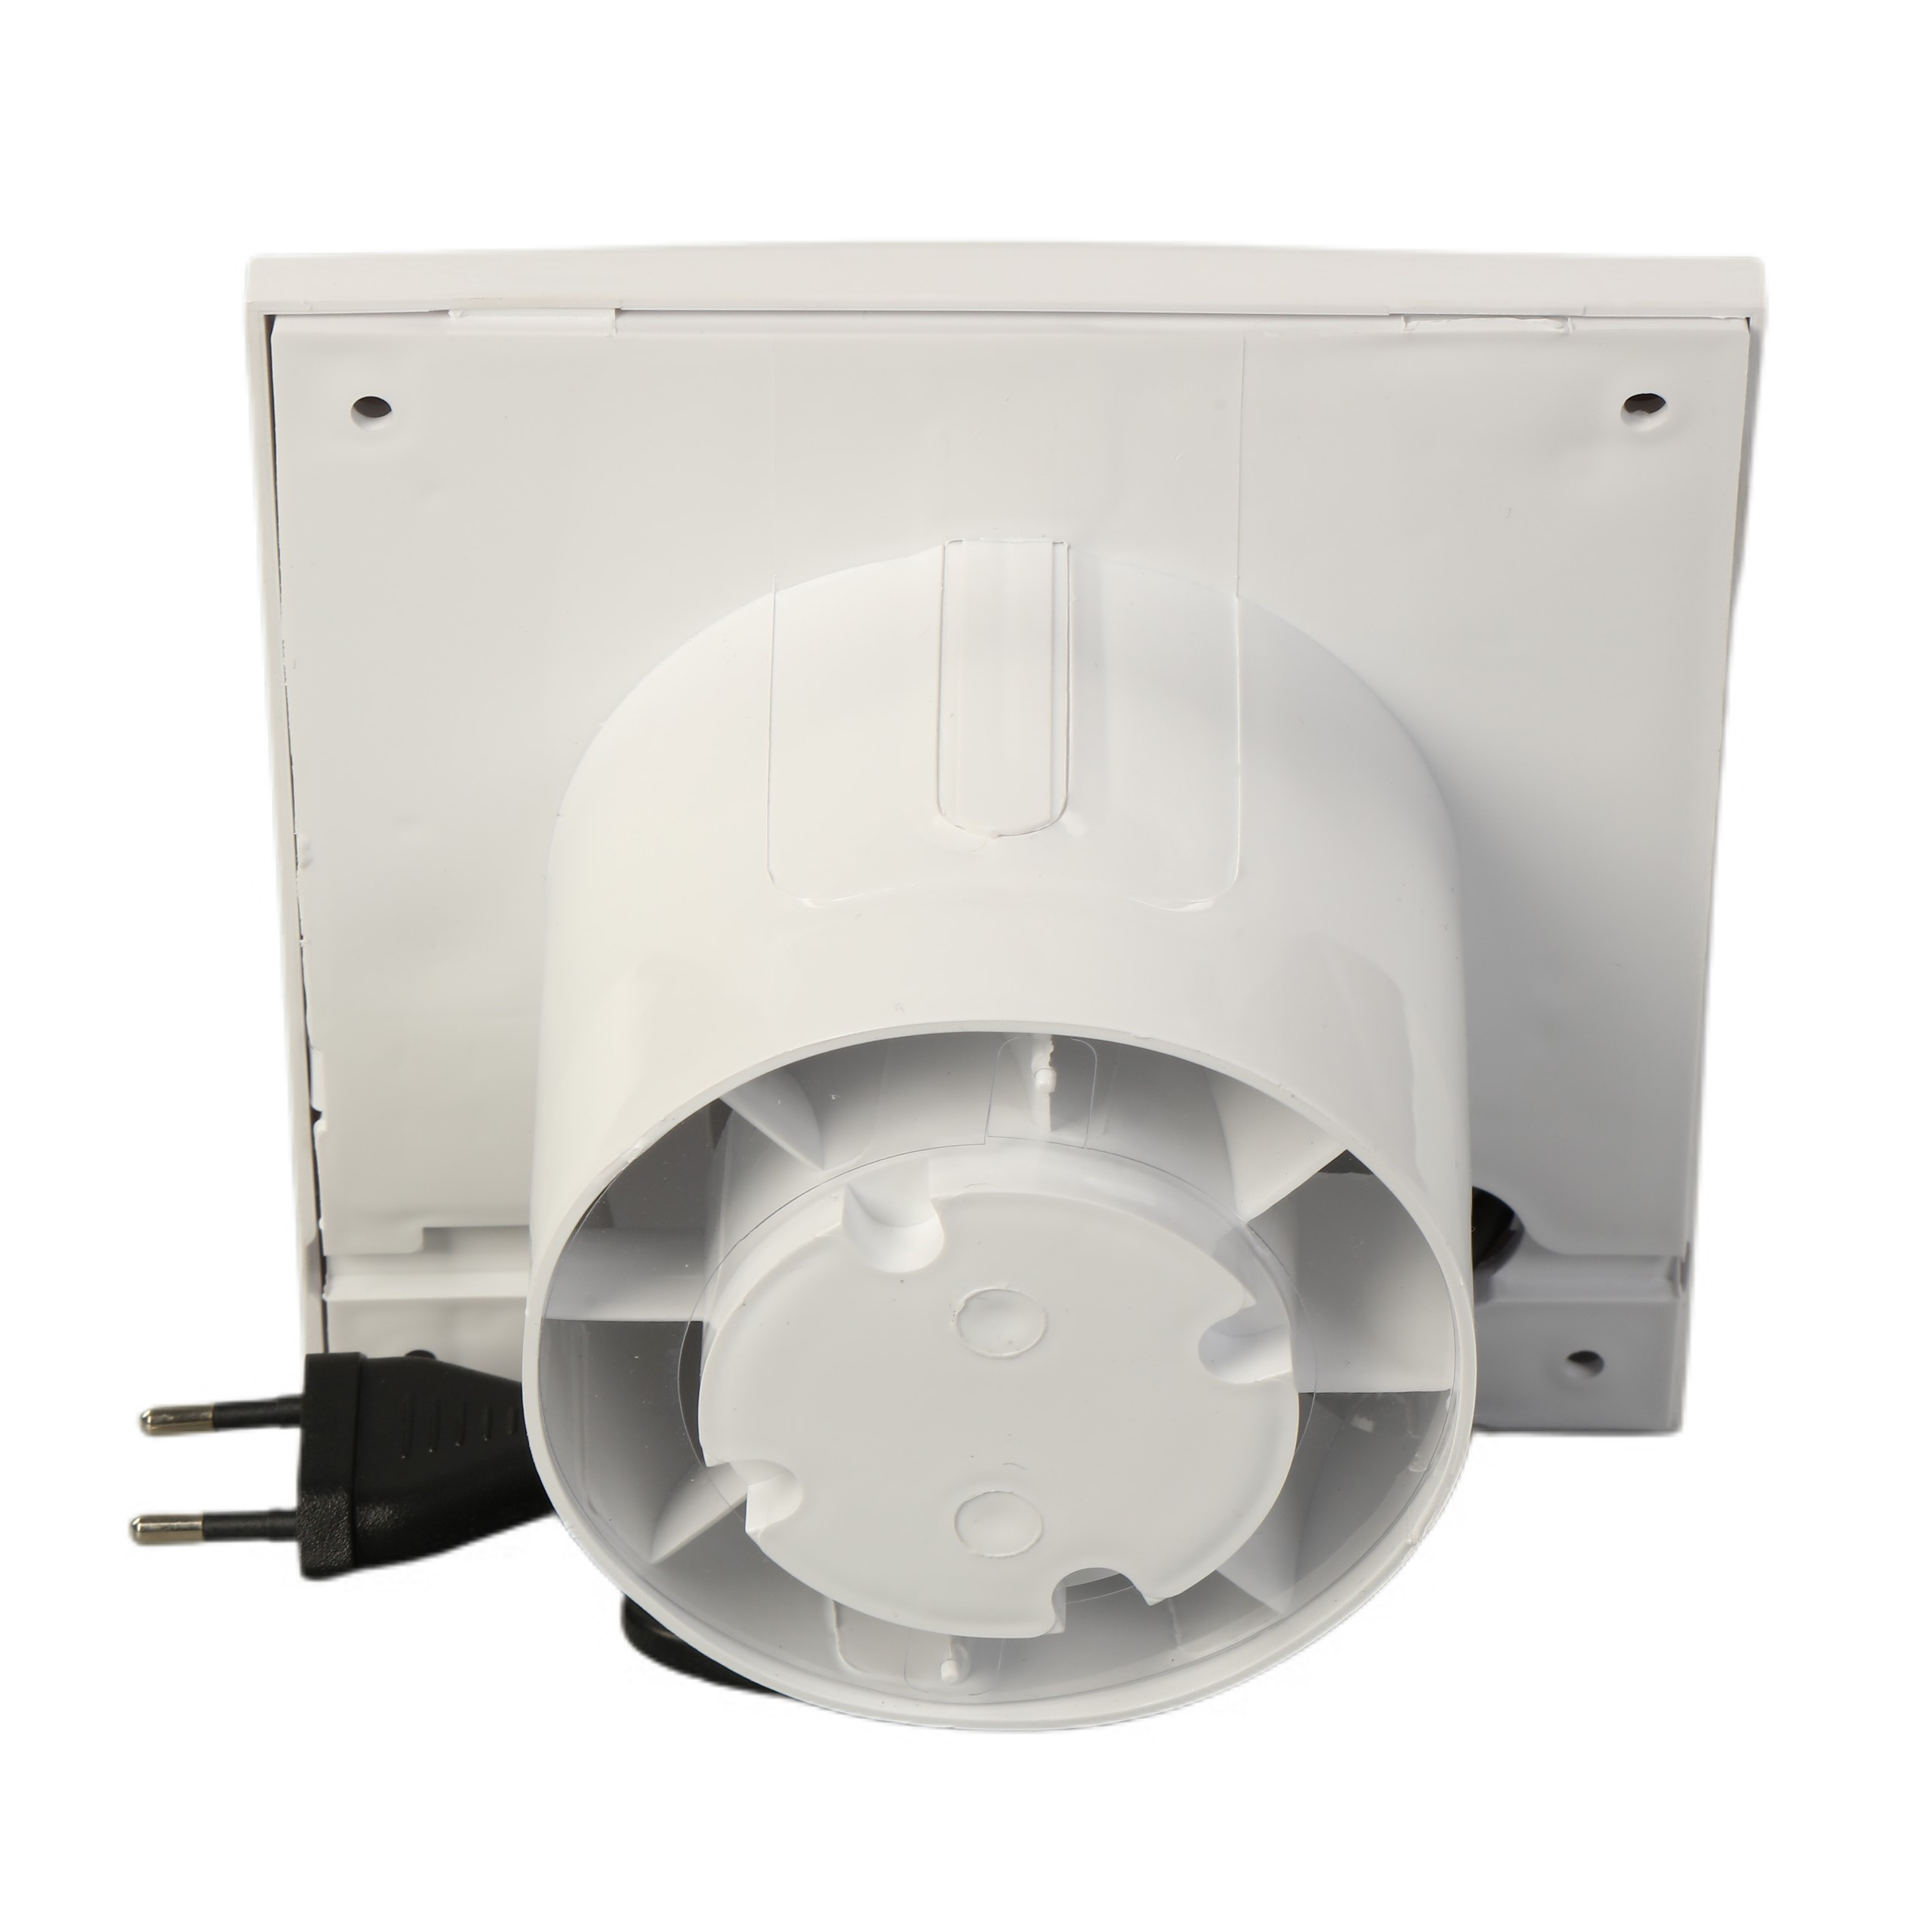 Ventilation Bathroom Household Kitchen Ceiling Fan with Led Light Exhaust Fan